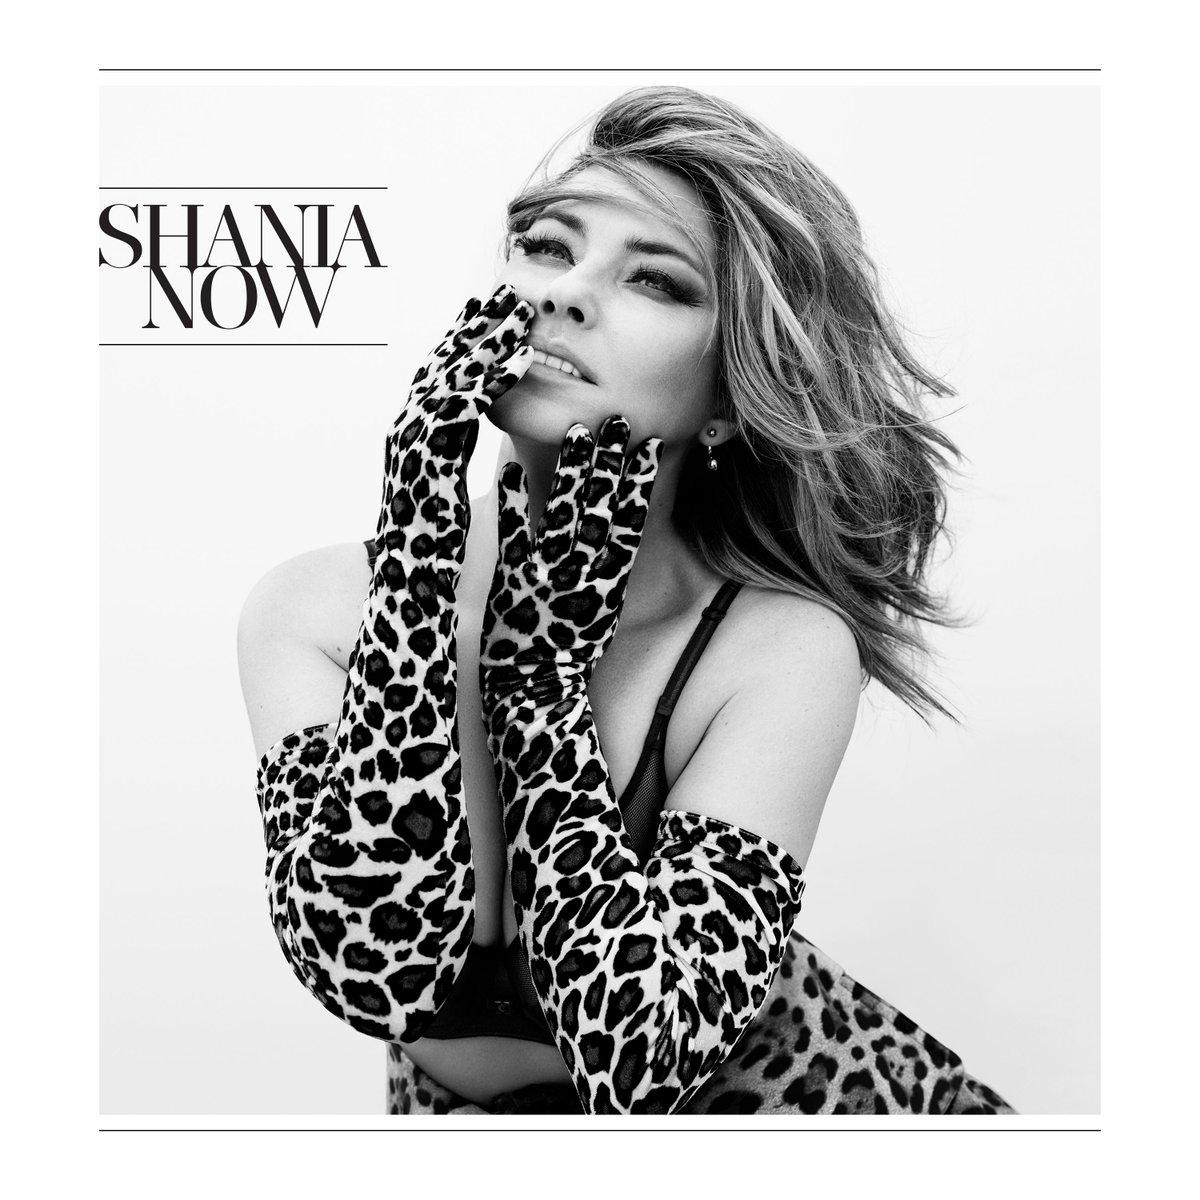 Shania Twain album art on Country Music News!